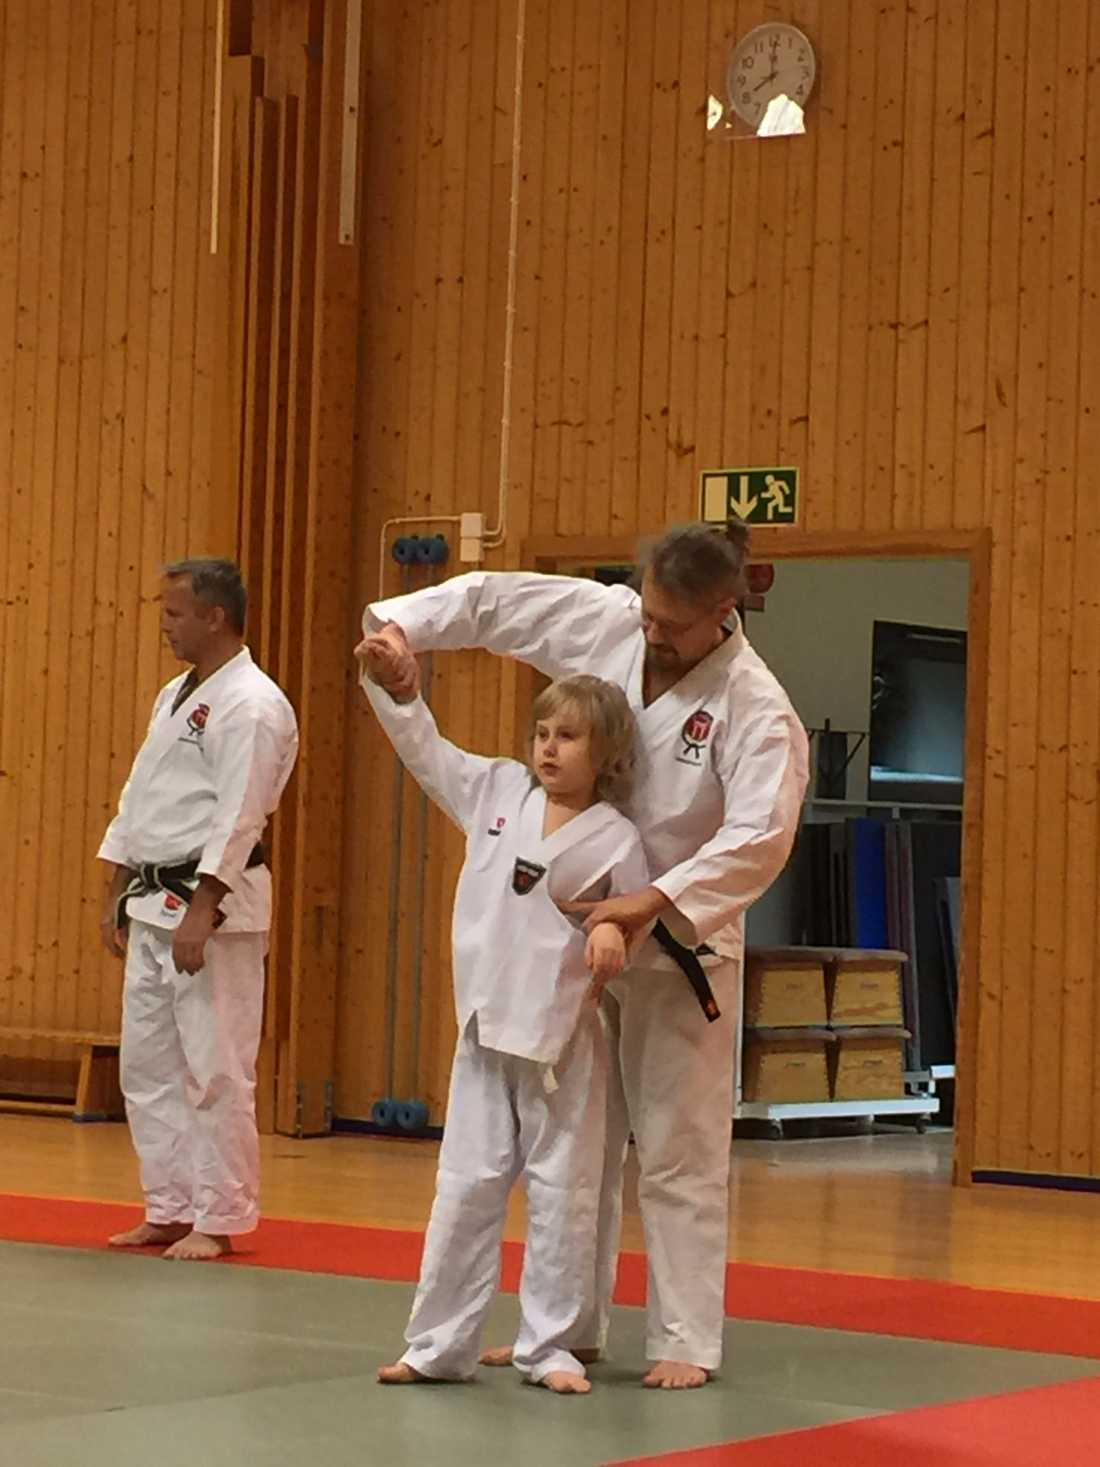 Pappa Magnus och Conrad tränar jujutsu